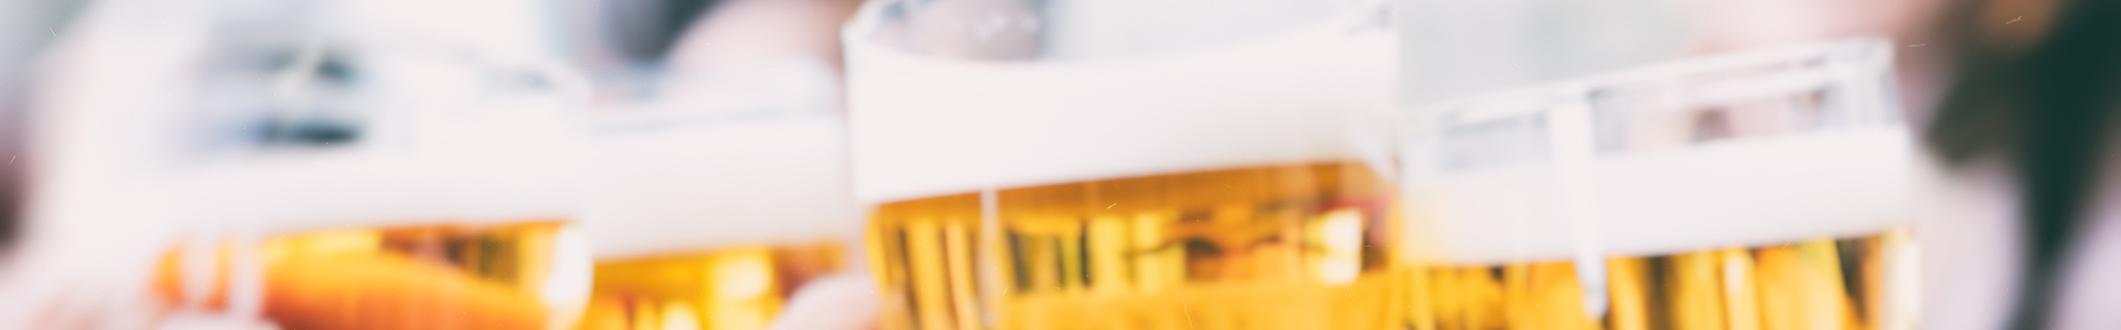 Bier alcohol